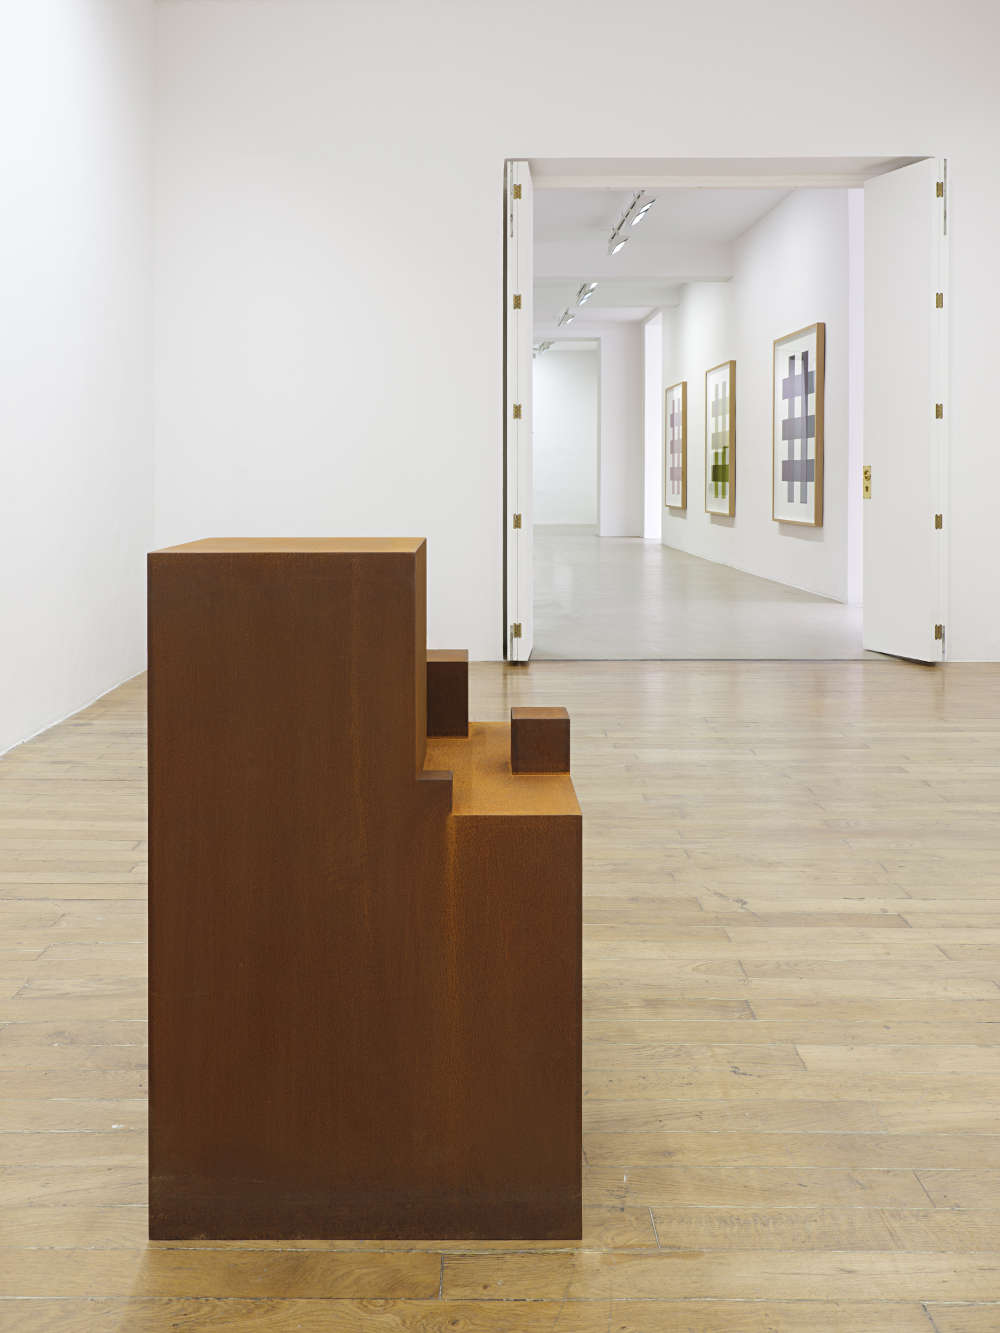 Galerie Chantal Crousel Fabrice Gygi 7